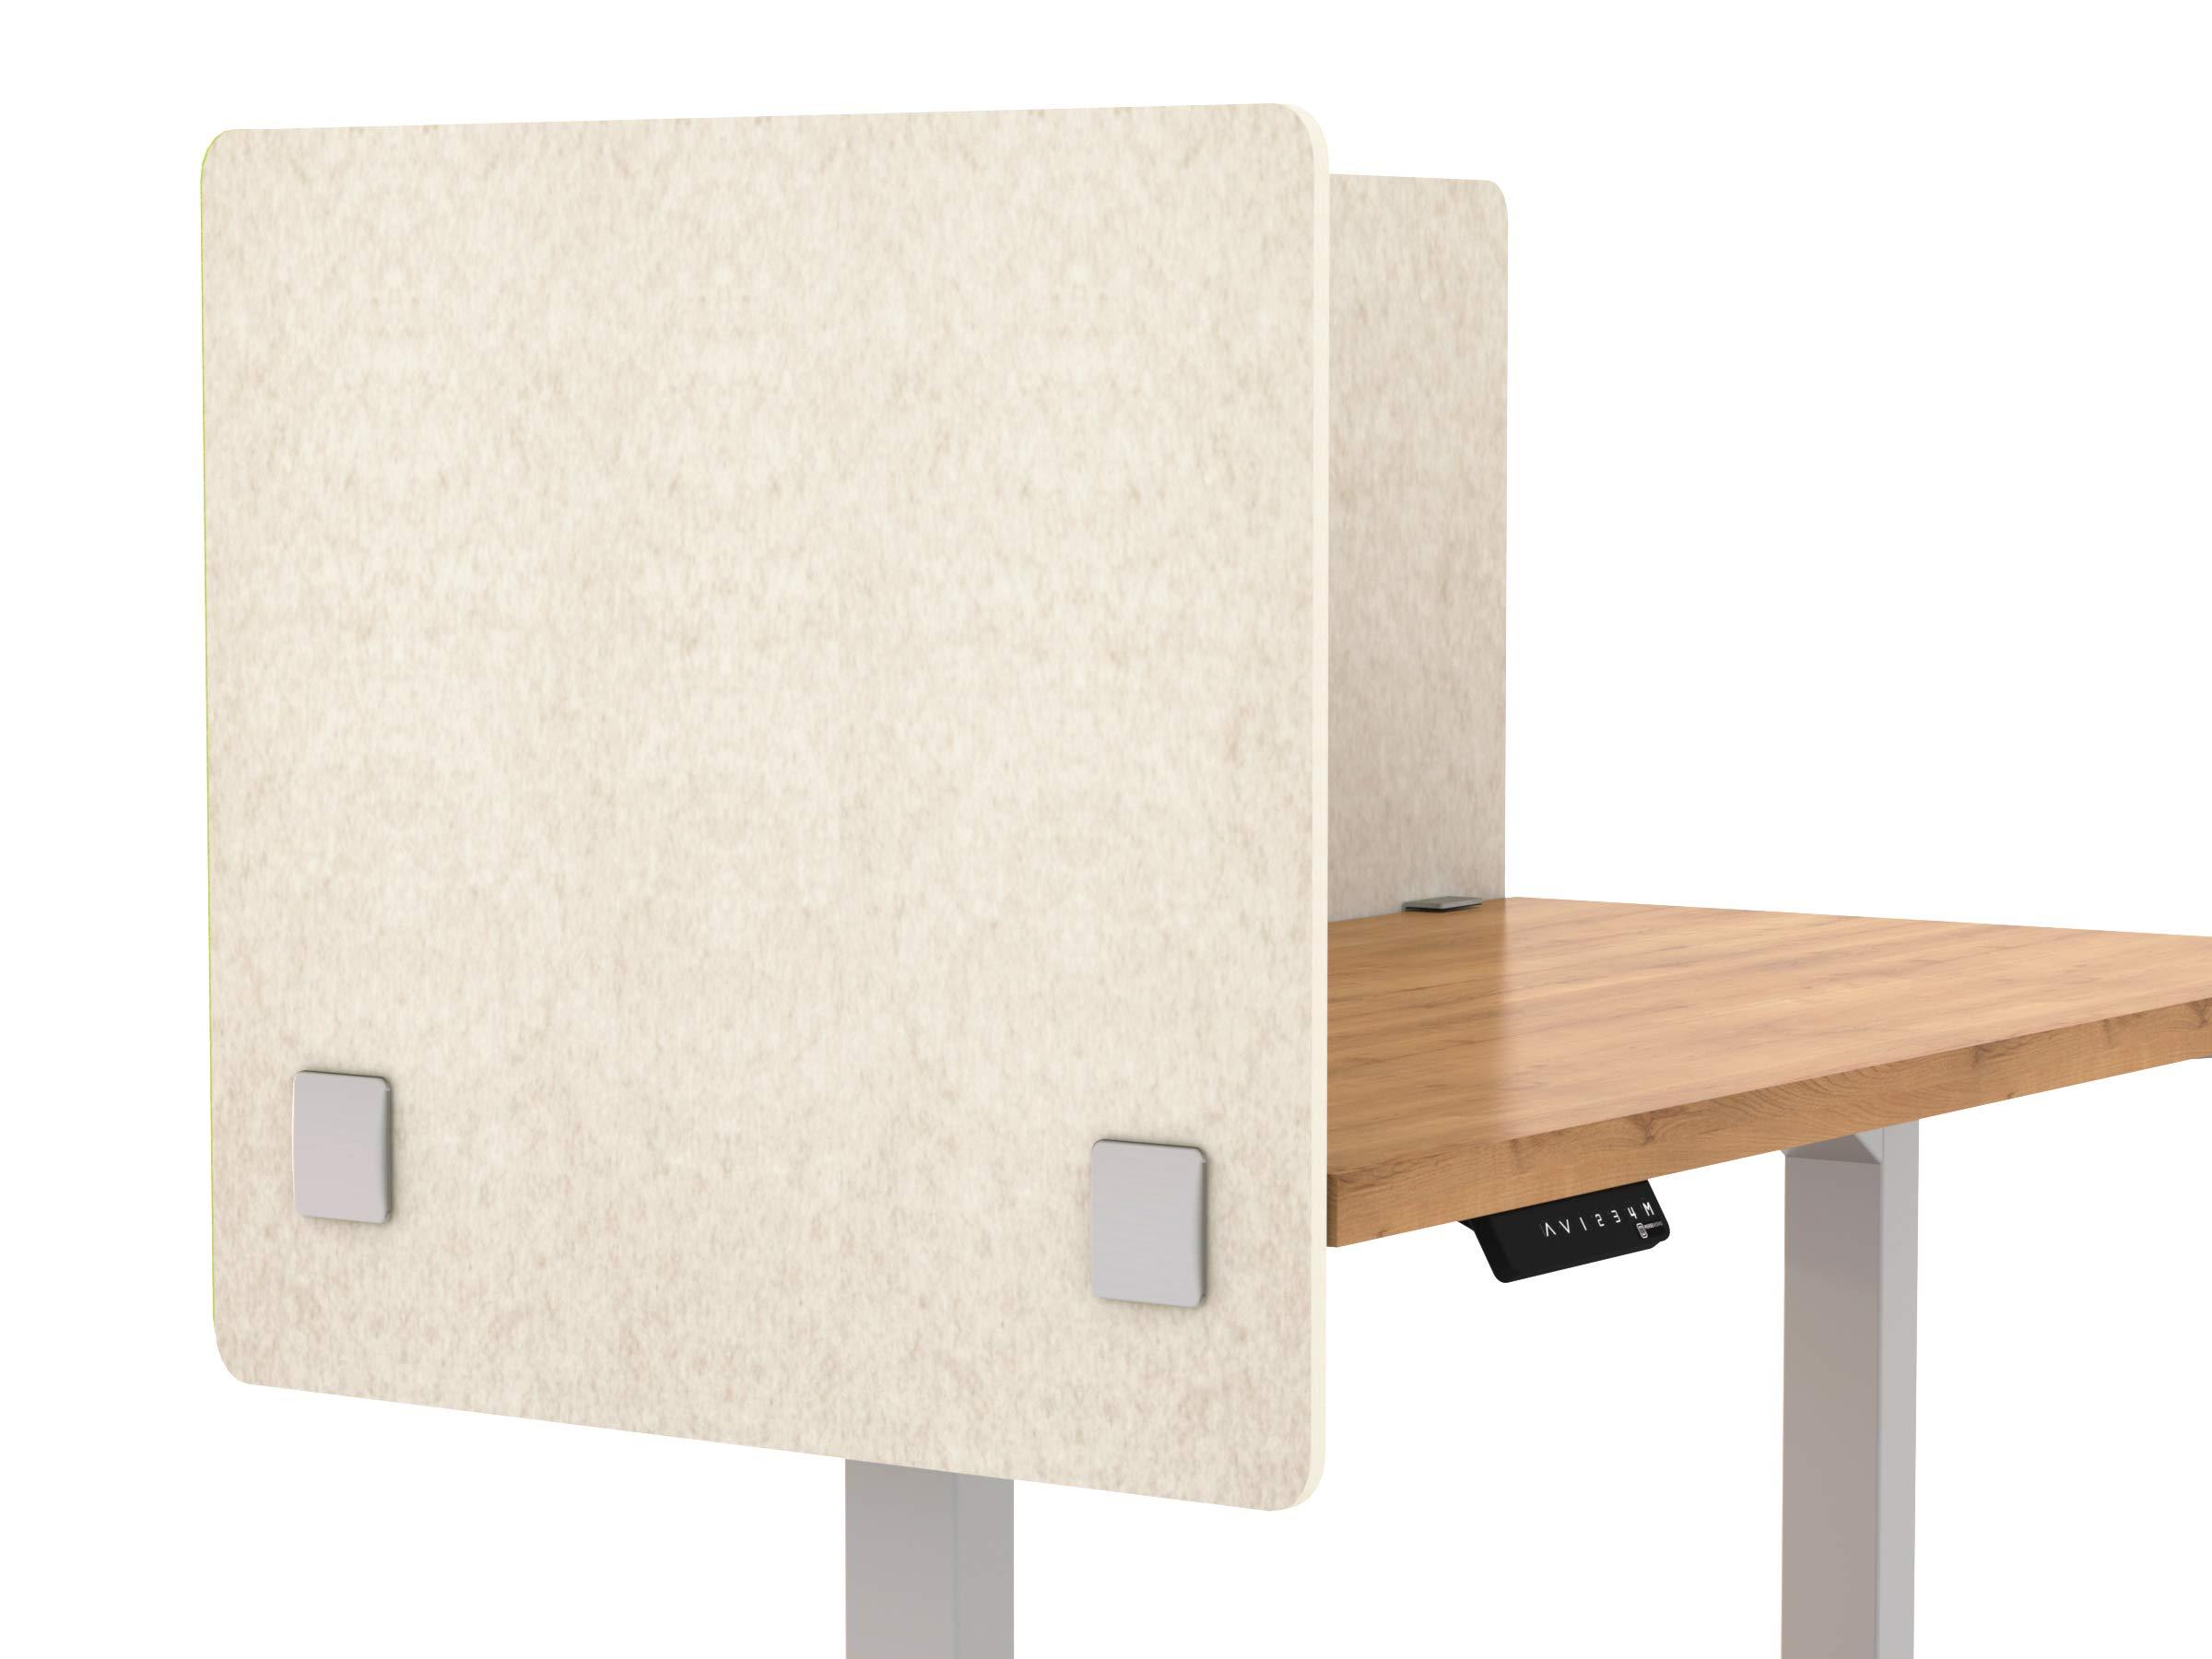 VaRoom Acoustic Partition, Sound Absorbing Desk Divider - 24'' W x 24''H Privacy Desk Mounted Cubicle Panel, Linen by VaRoom